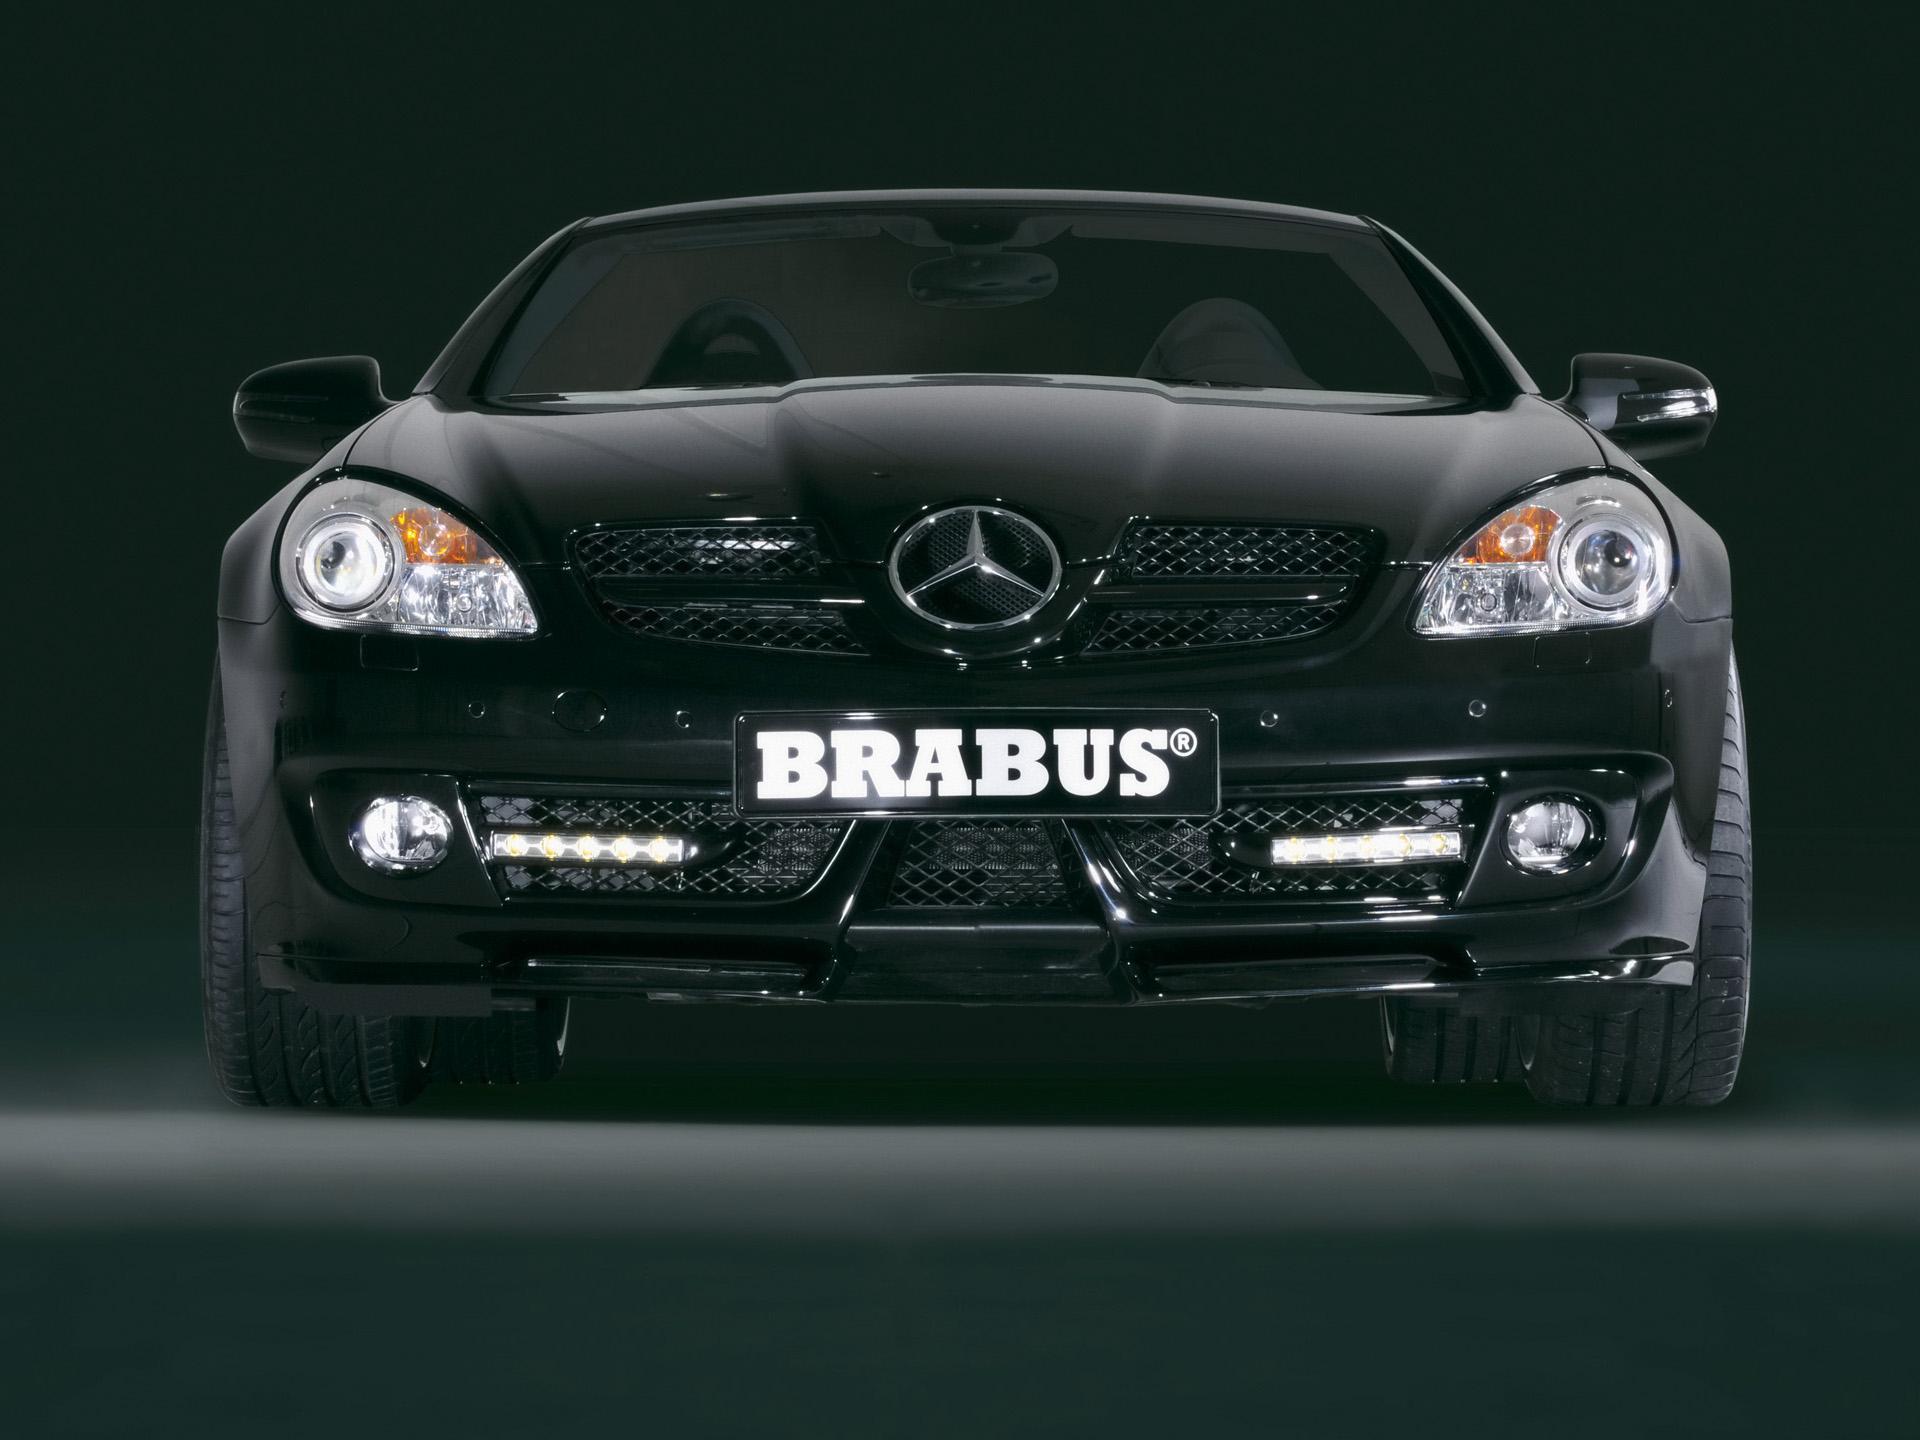 Complete Black Wallpaper 2008 Brabus Slk News And Information Conceptcarz Com